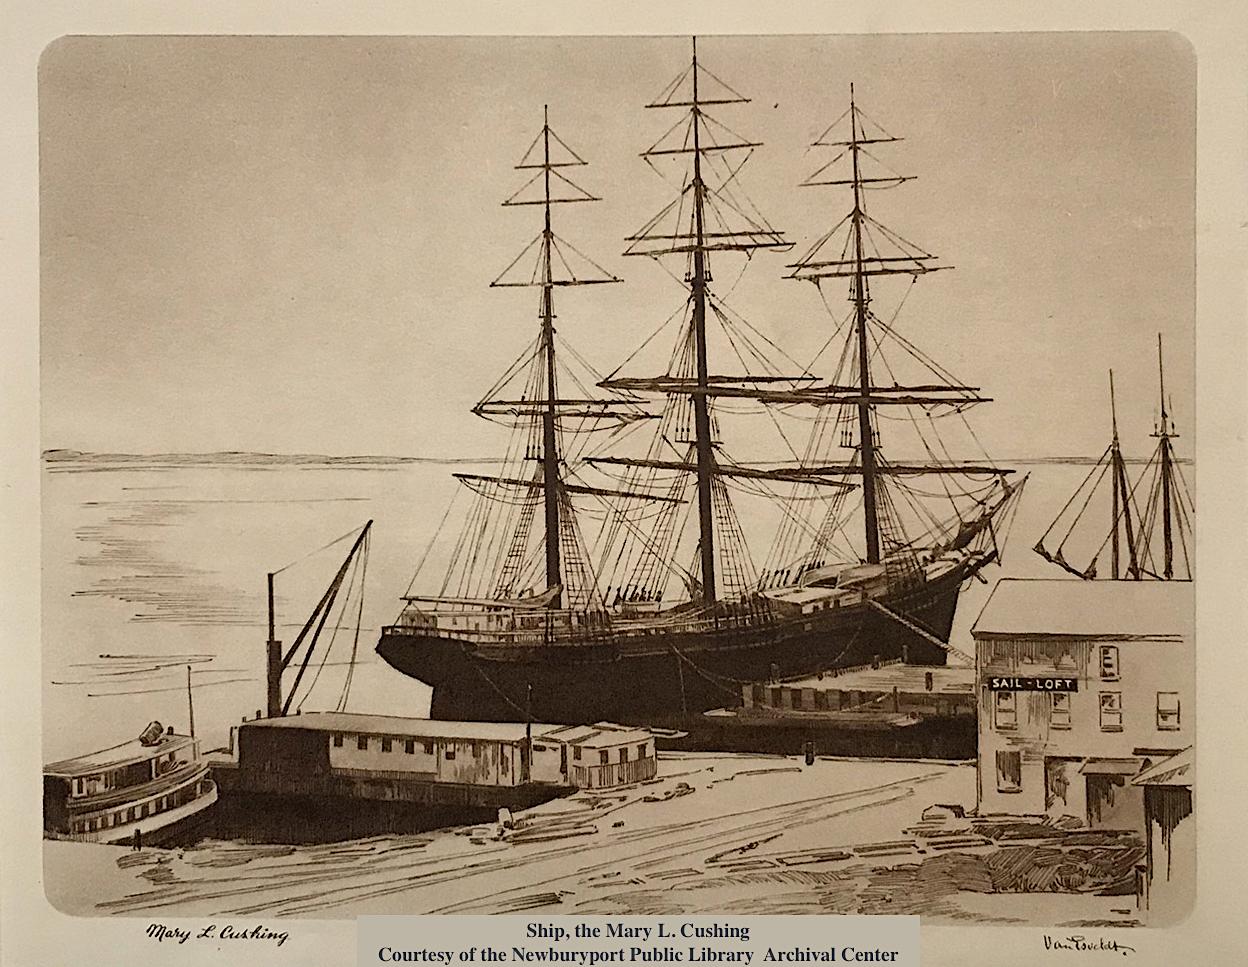 Ship the Mary L Cushing Newburyport MA